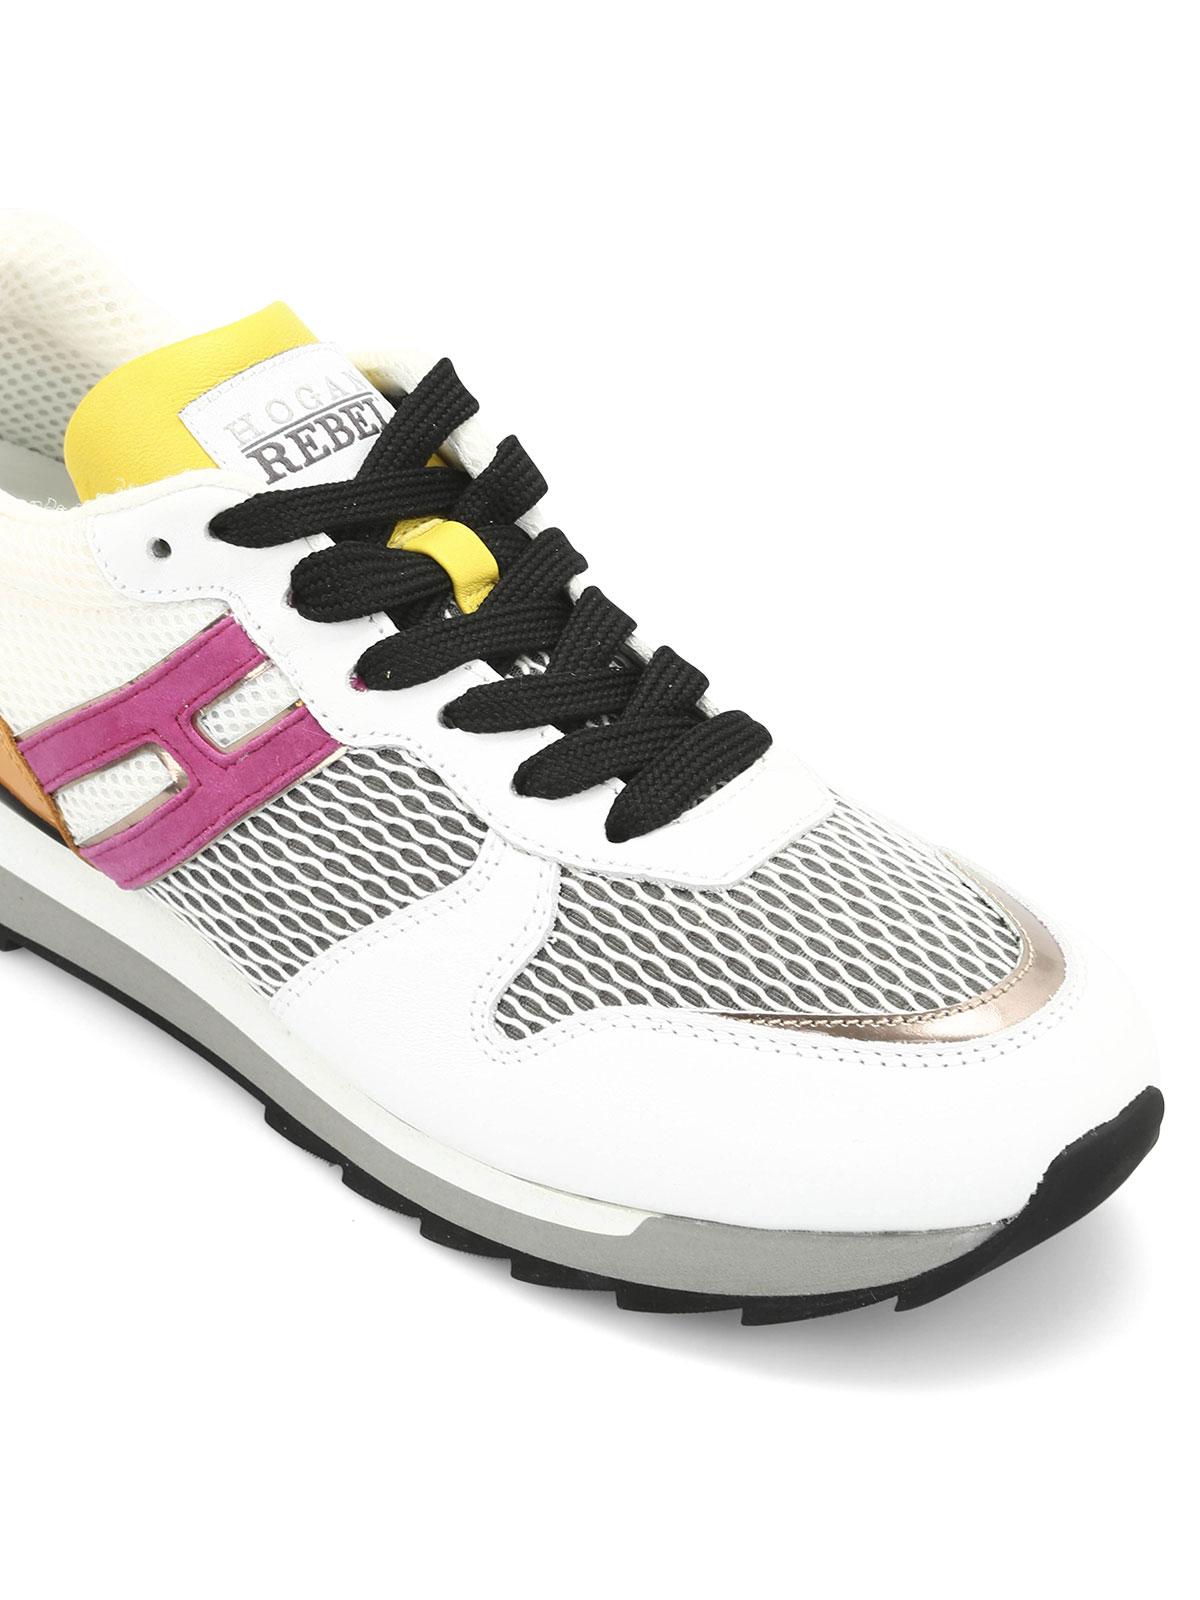 Hogan Rebel Shoes Online Shop